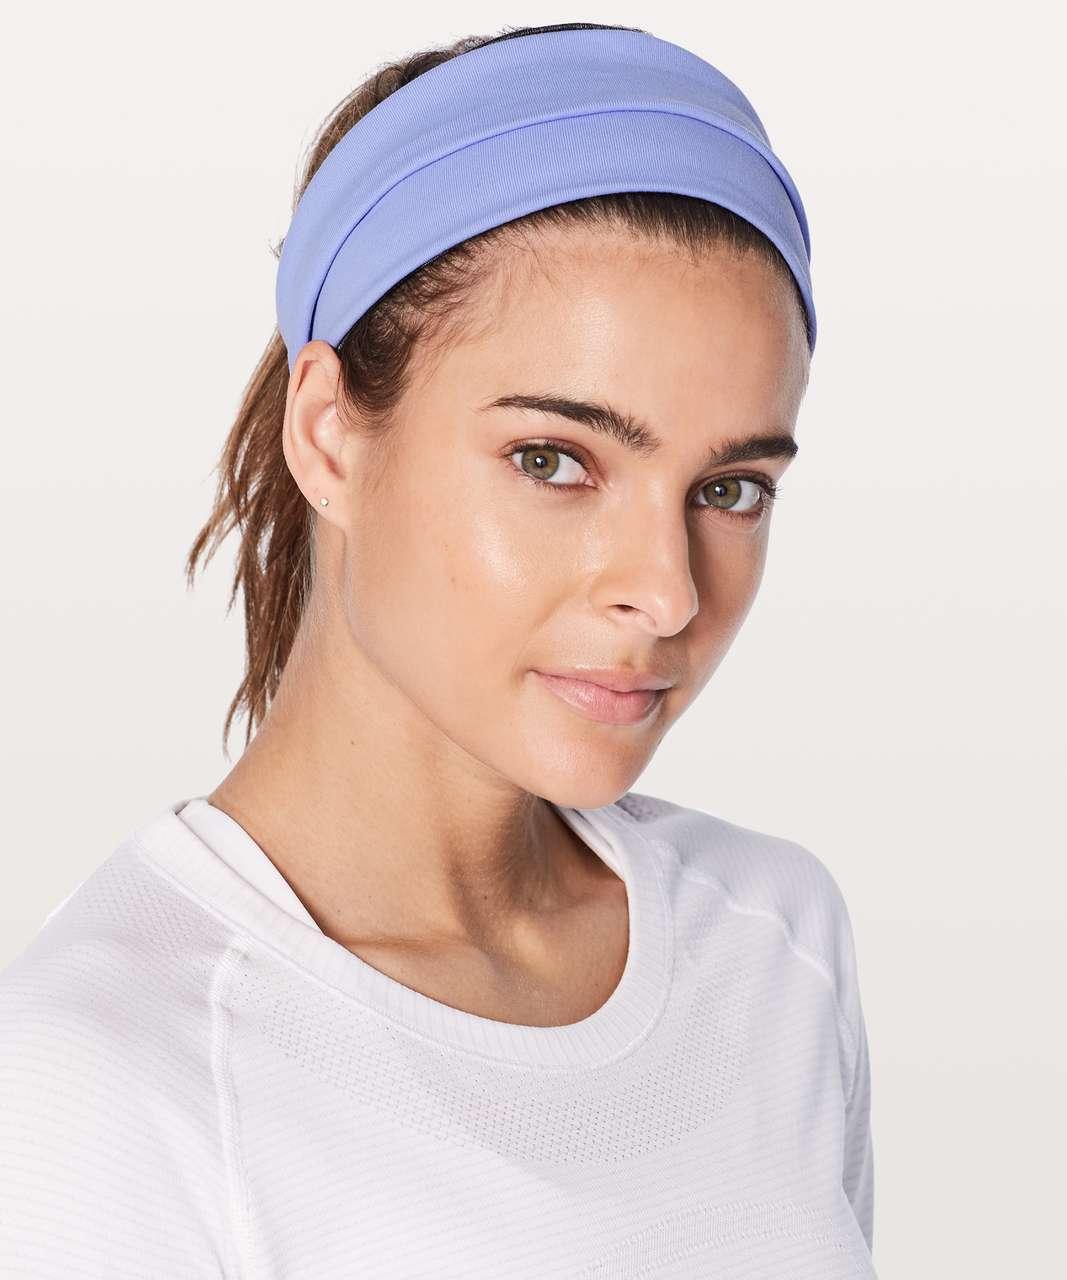 Lululemon Fringe Fighter Headband - Hydrangea Blue / Heathered Black